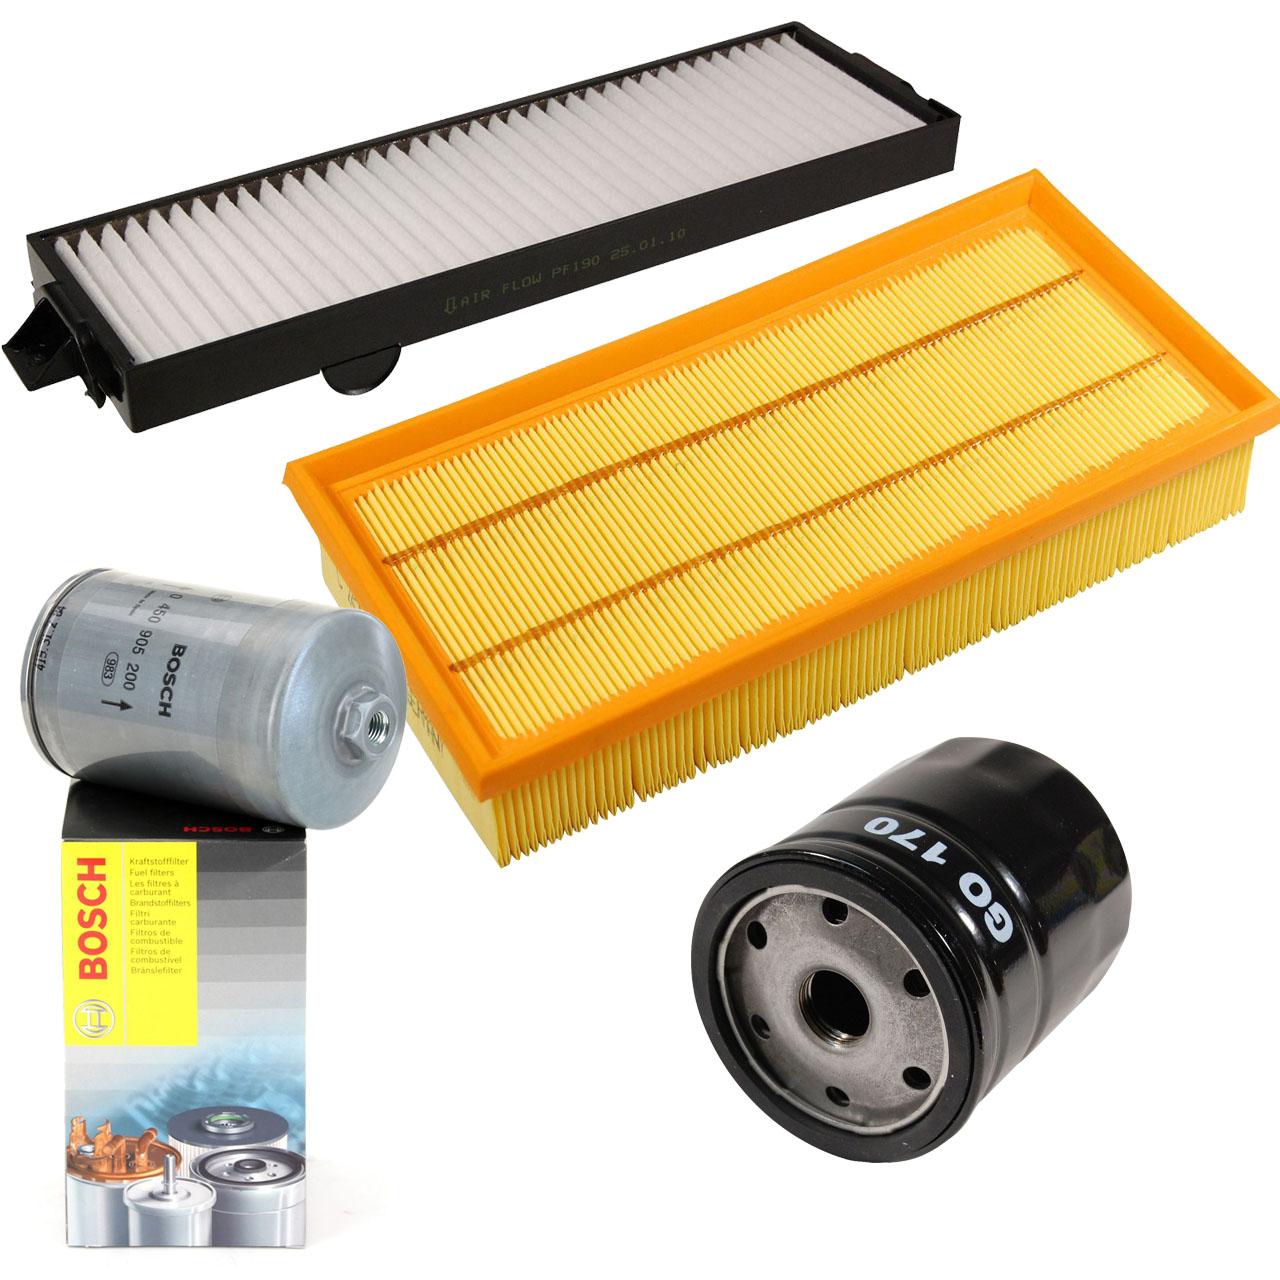 Filterpaket Filterset für Saab 9-3 (YS3D) 2.0Turbo 2.3Turbo 150-224PS